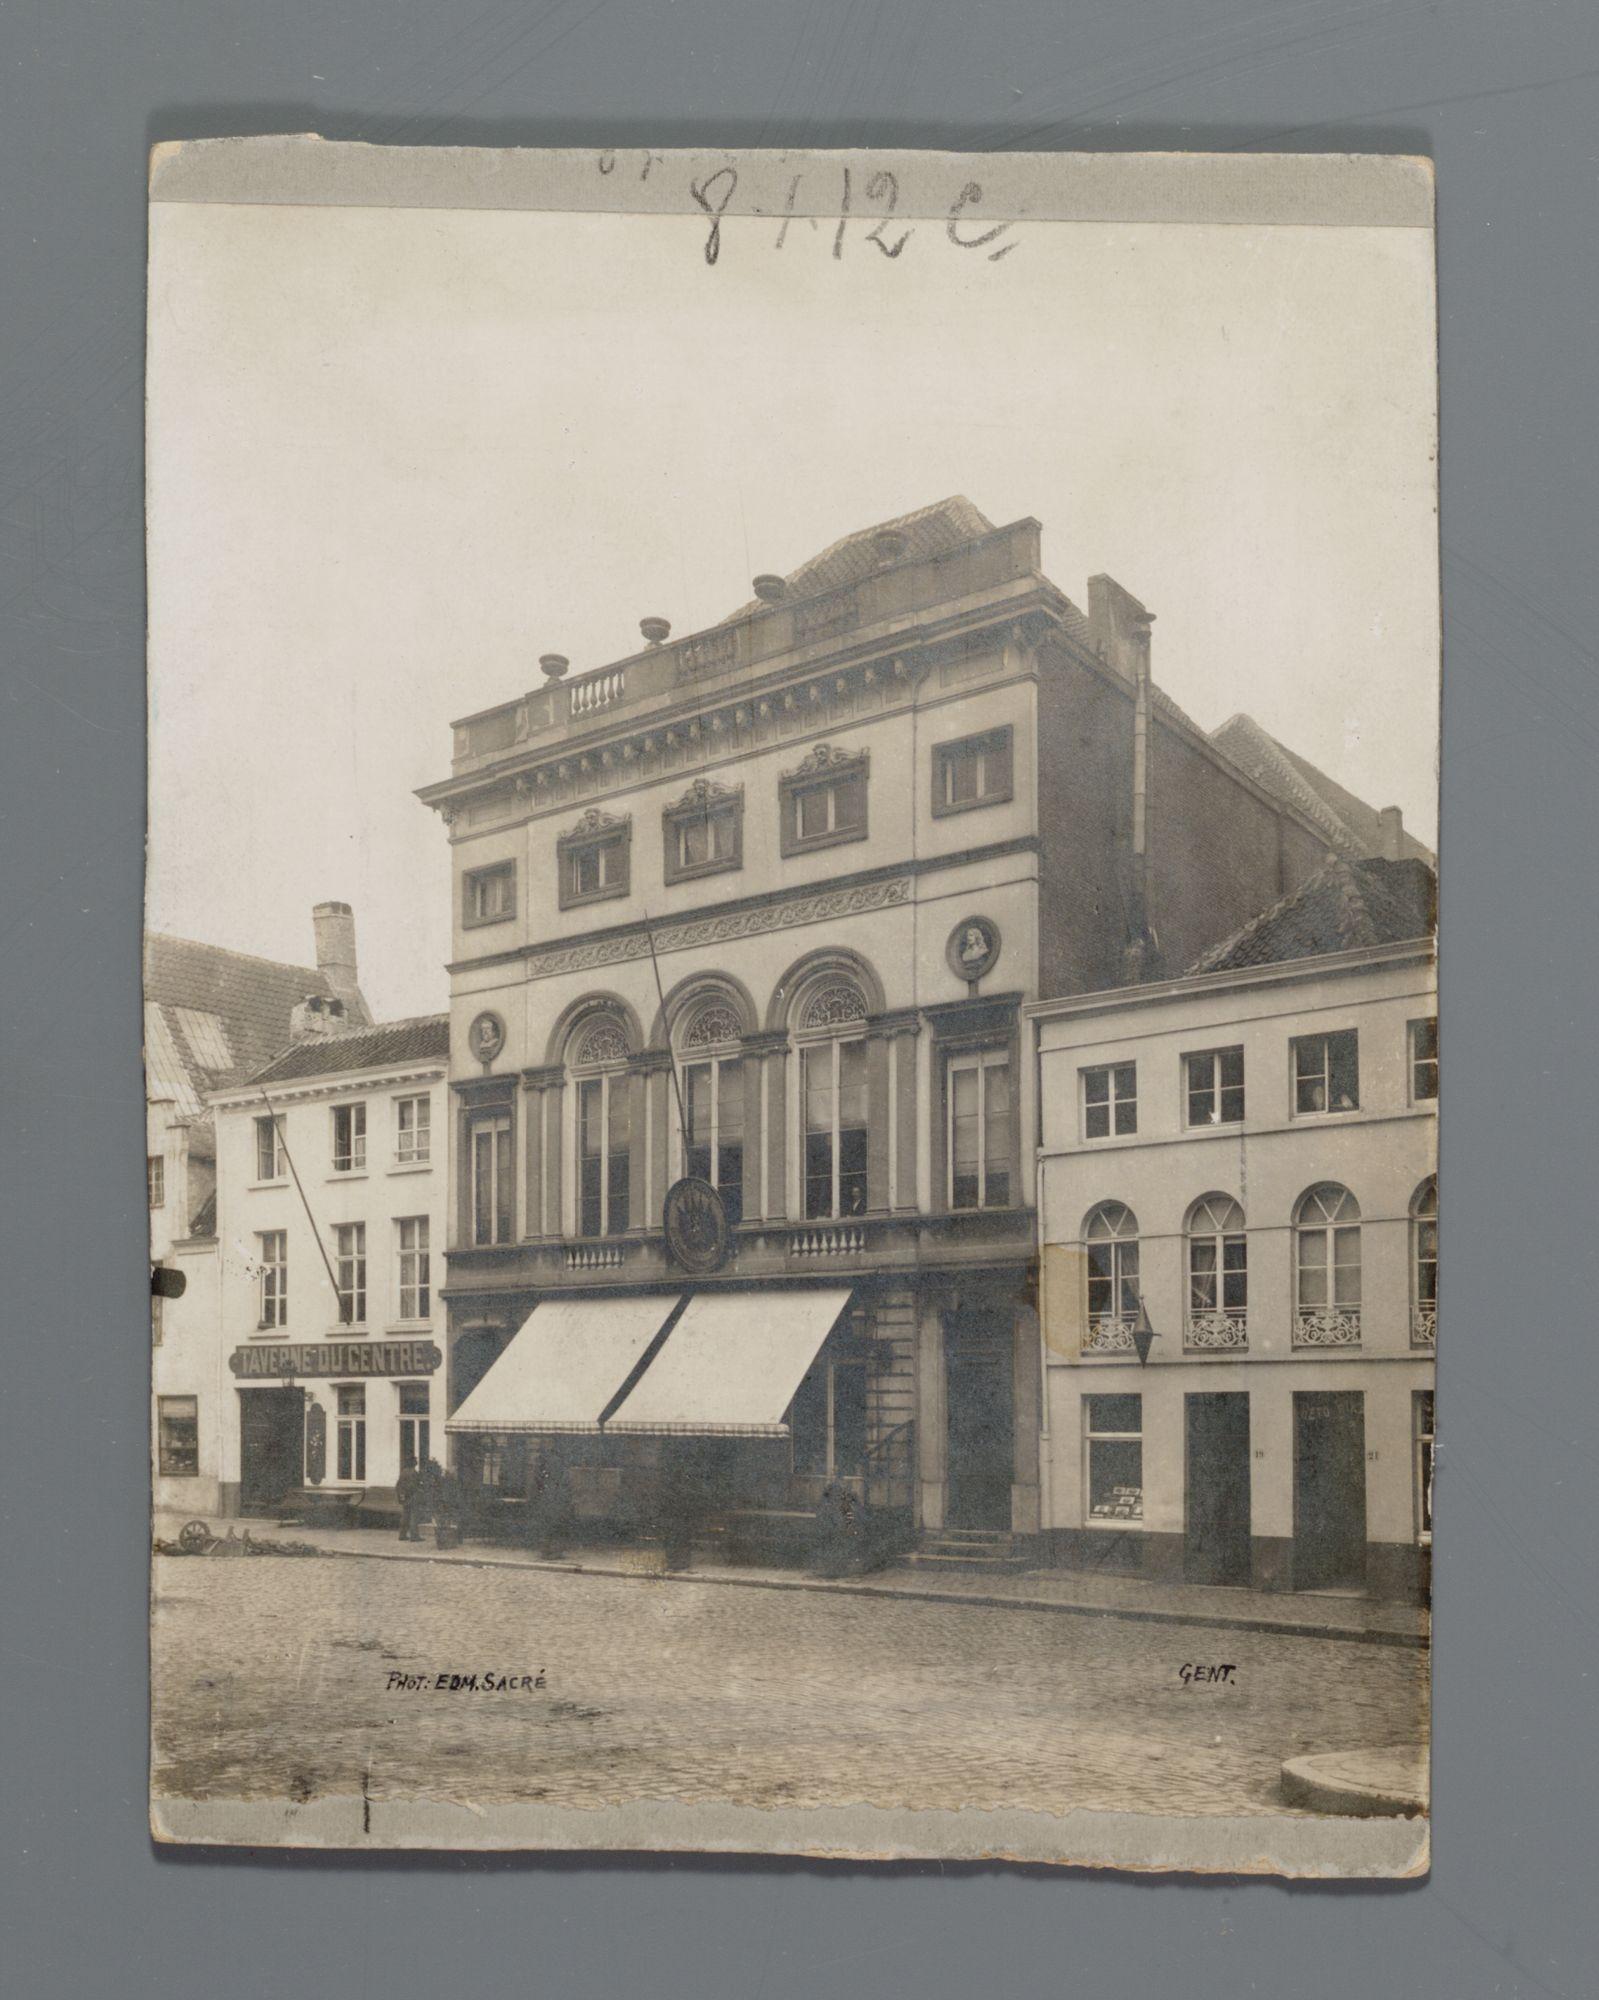 Gent: Walpoortstraat: Minardschouwburg en Taverne du Centre